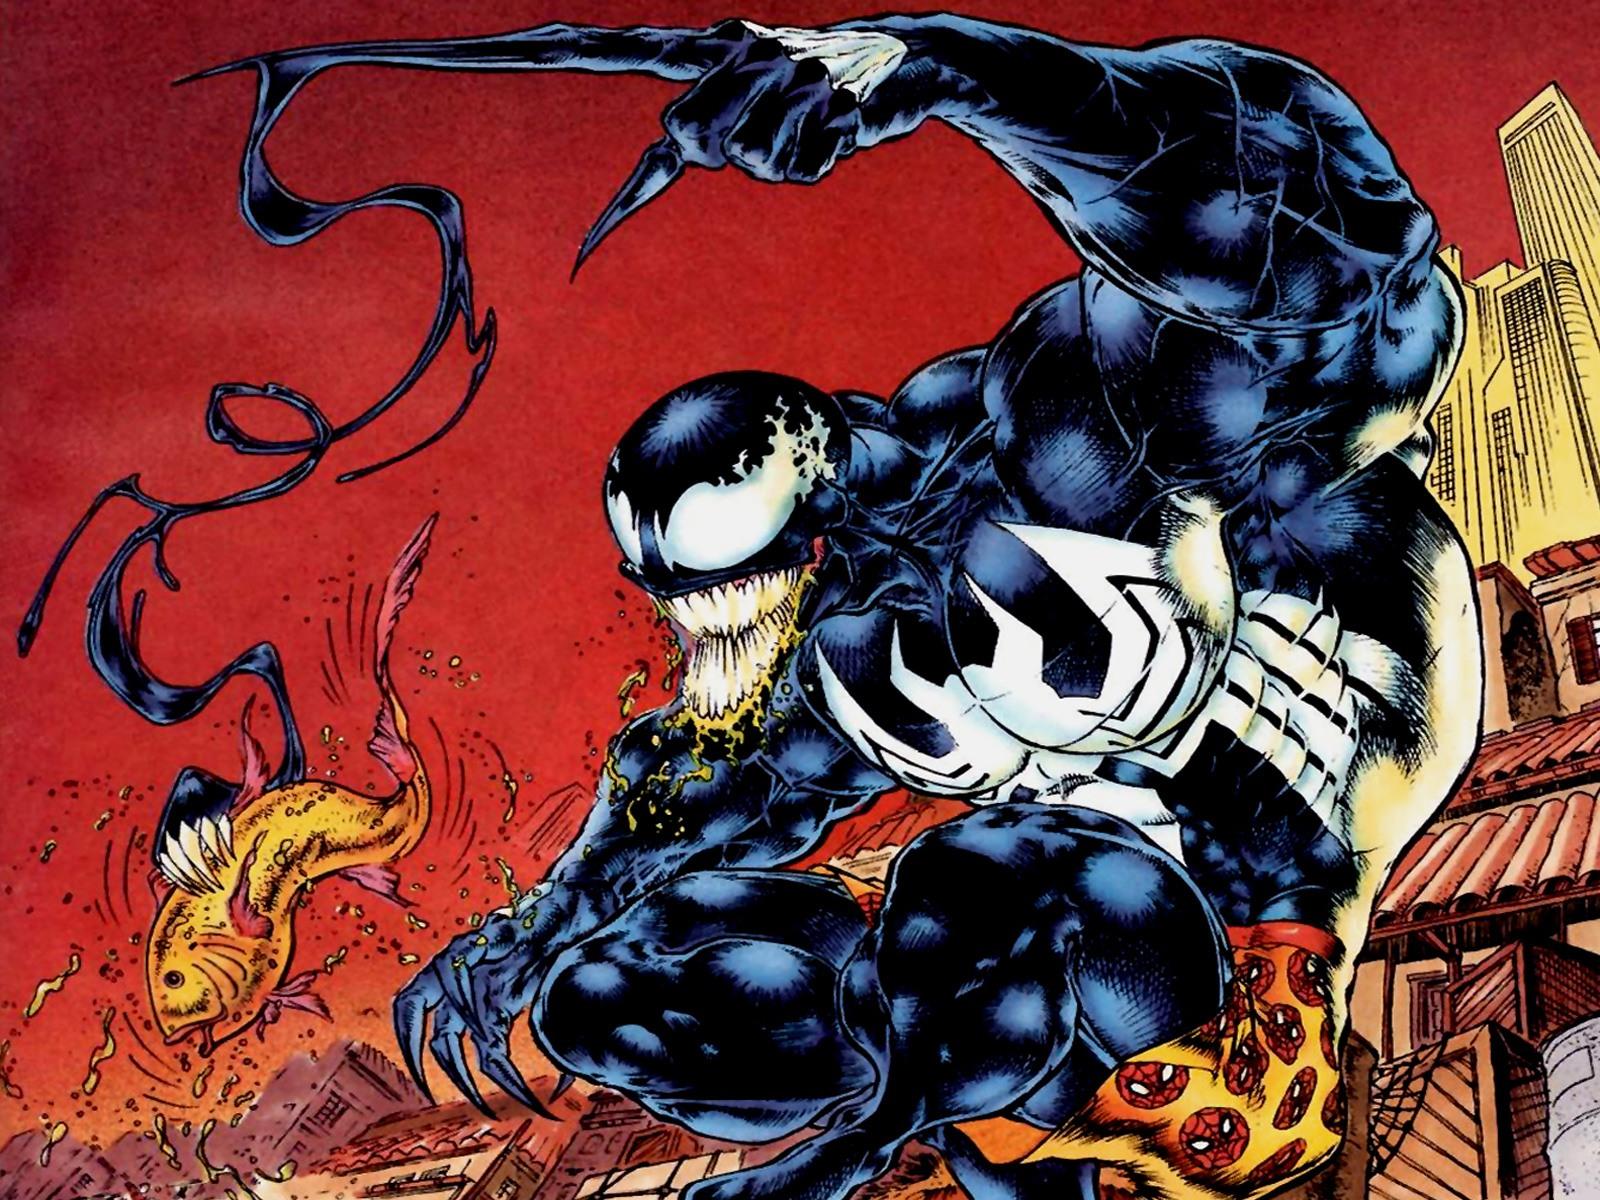 Venom Wallpaper 1600x1200